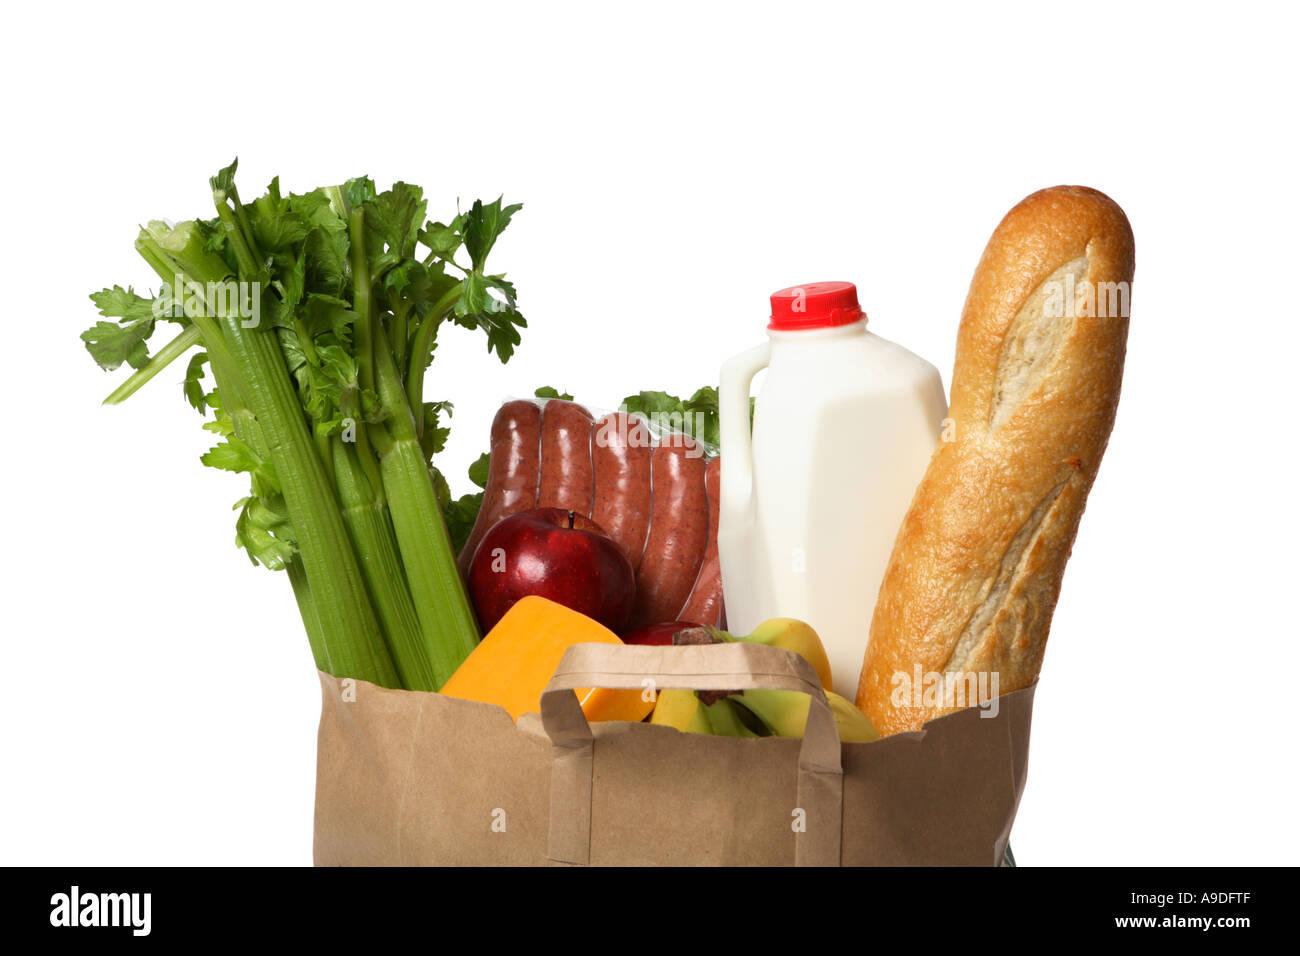 Bag of Groceries - Stock Image